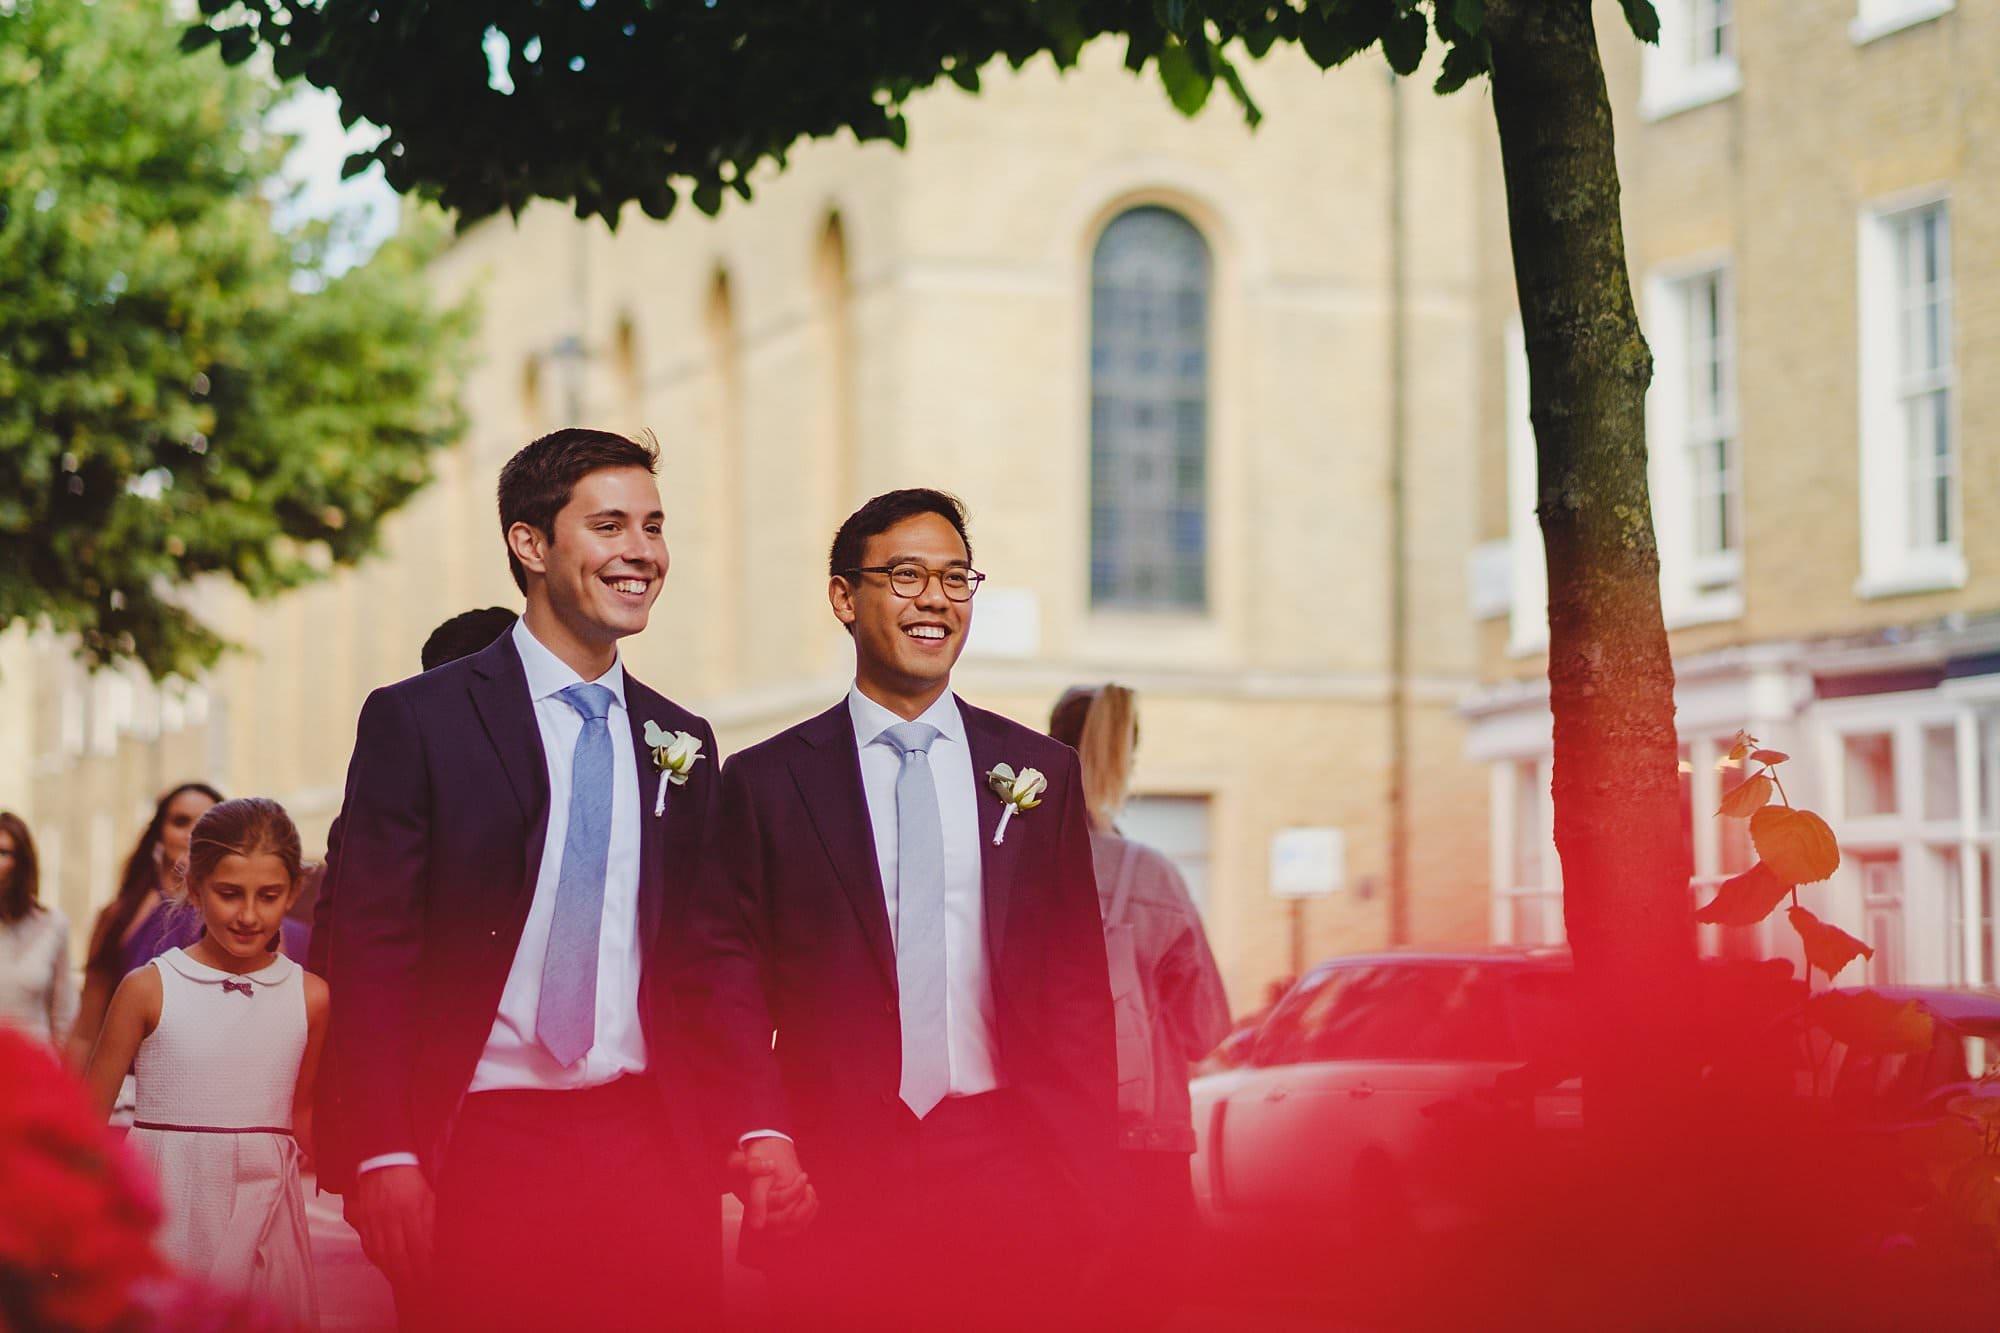 old marylebone town hall wedding photographer wedding jh 035 - Hugo + Josh   Marylebone